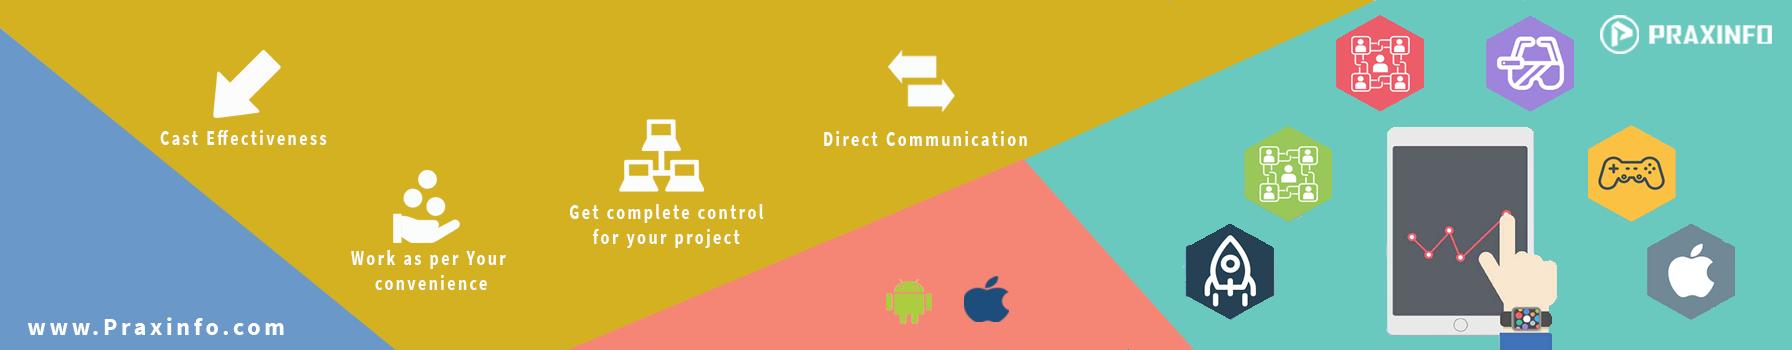 mobile-app-development-trends.png